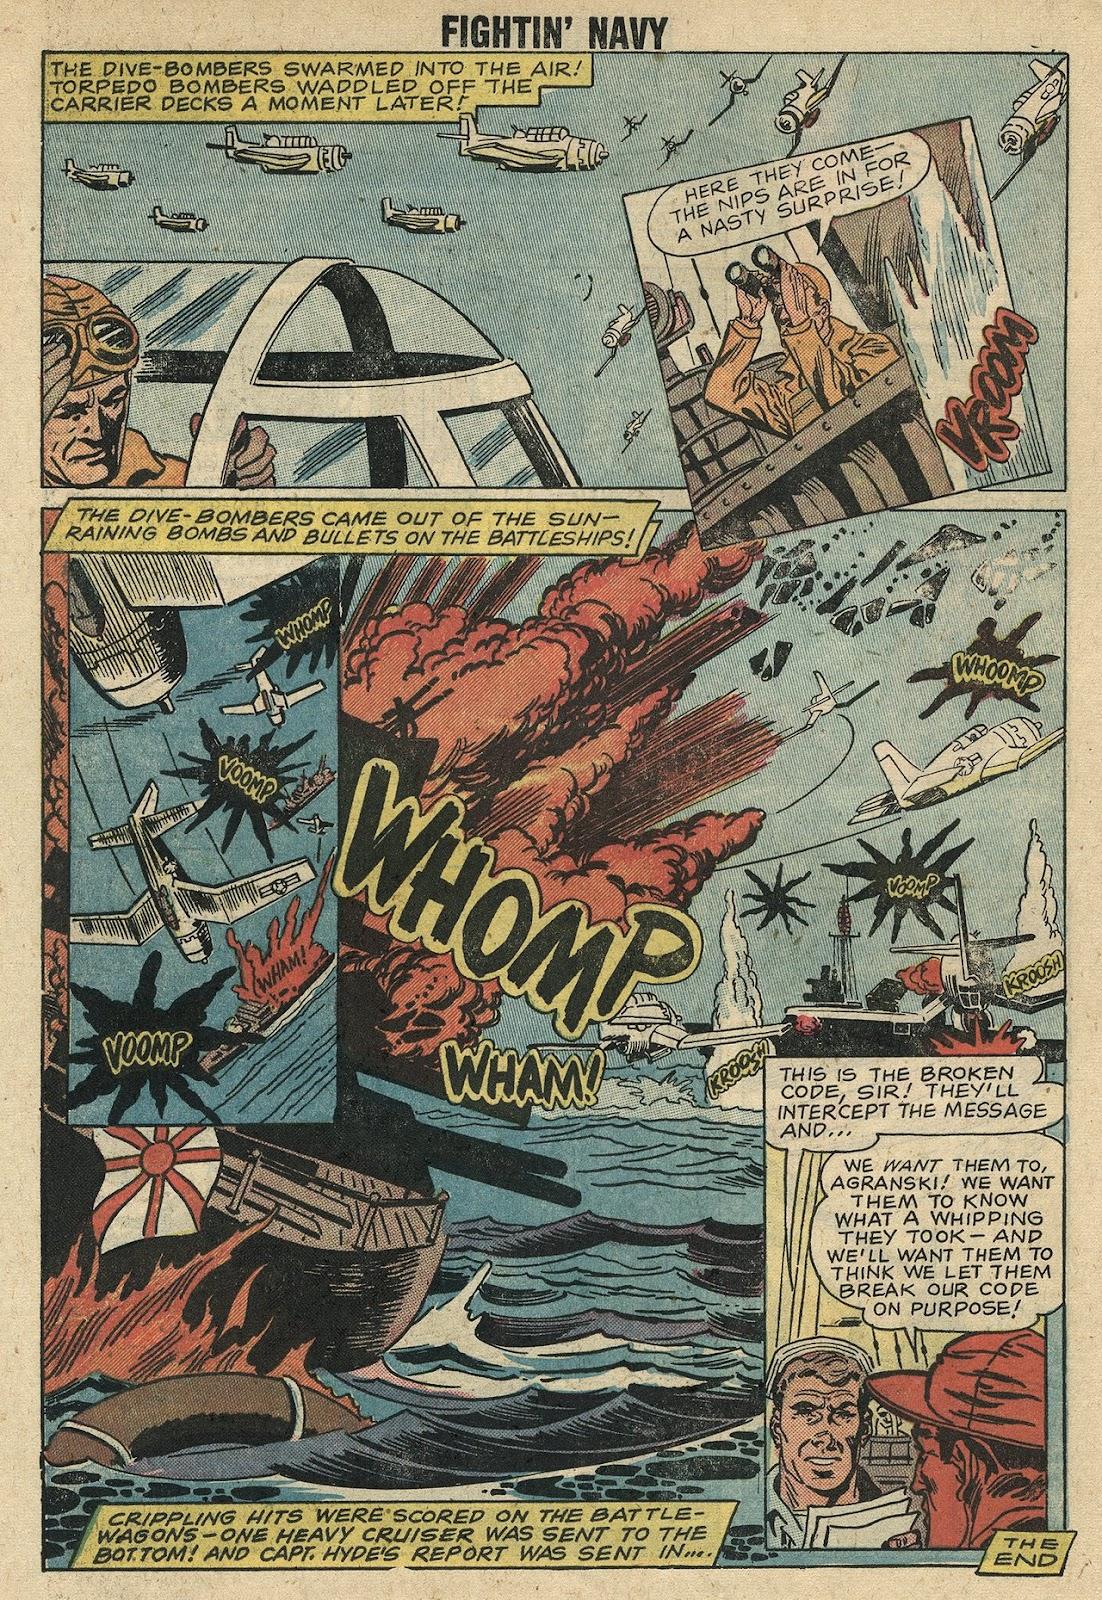 Read online Fightin' Navy comic -  Issue #86 - 25